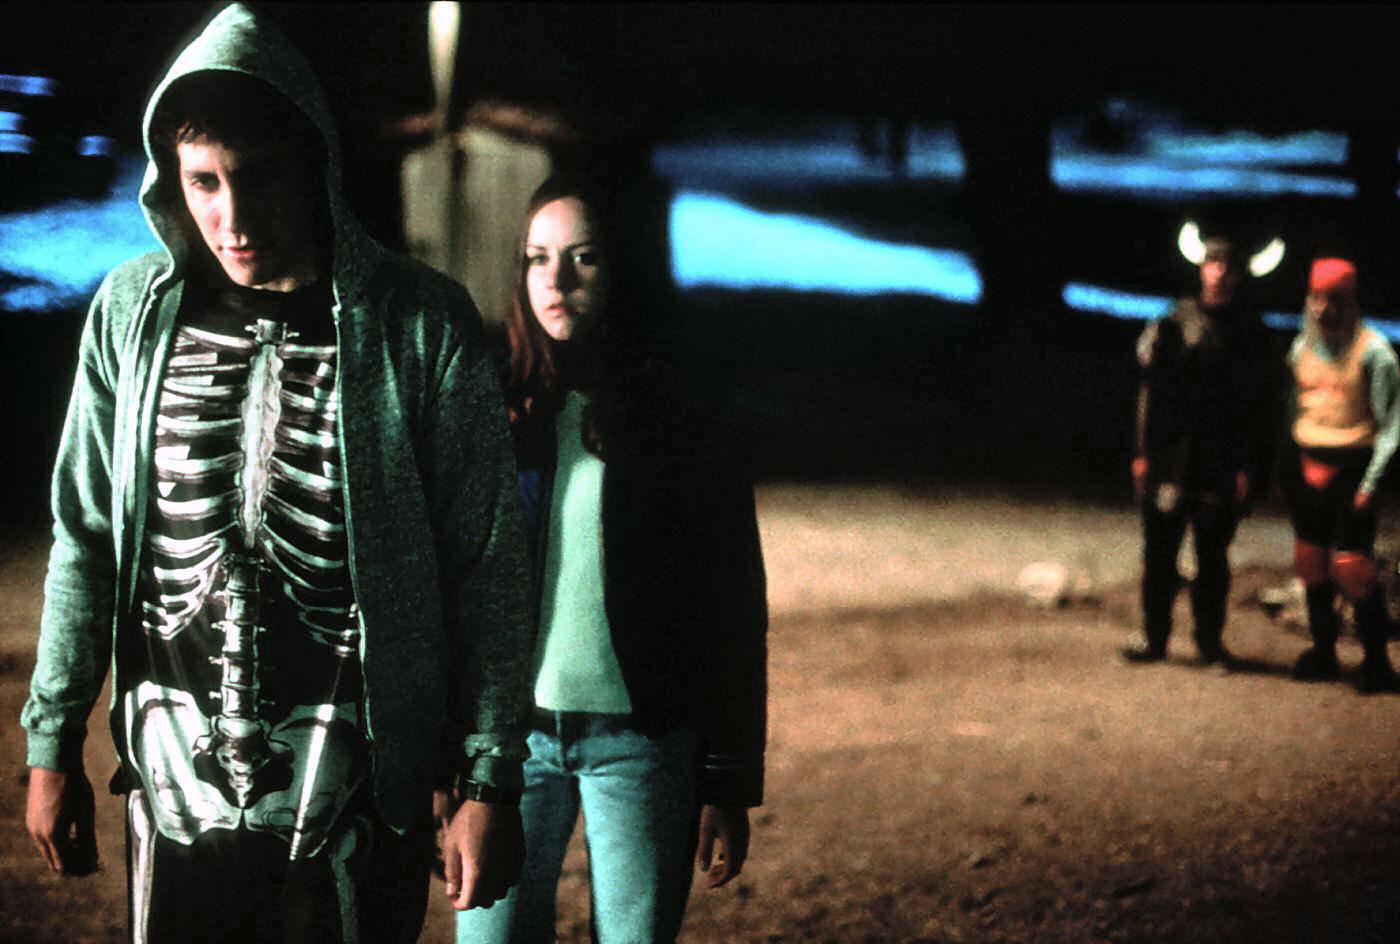 http://1.bp.blogspot.com/-d7iyzPrJ-3E/TqHvAlTqoOI/AAAAAAAAAFA/a36iWKSSTFo/s1600/donnie-darko-movie-image-4.jpg